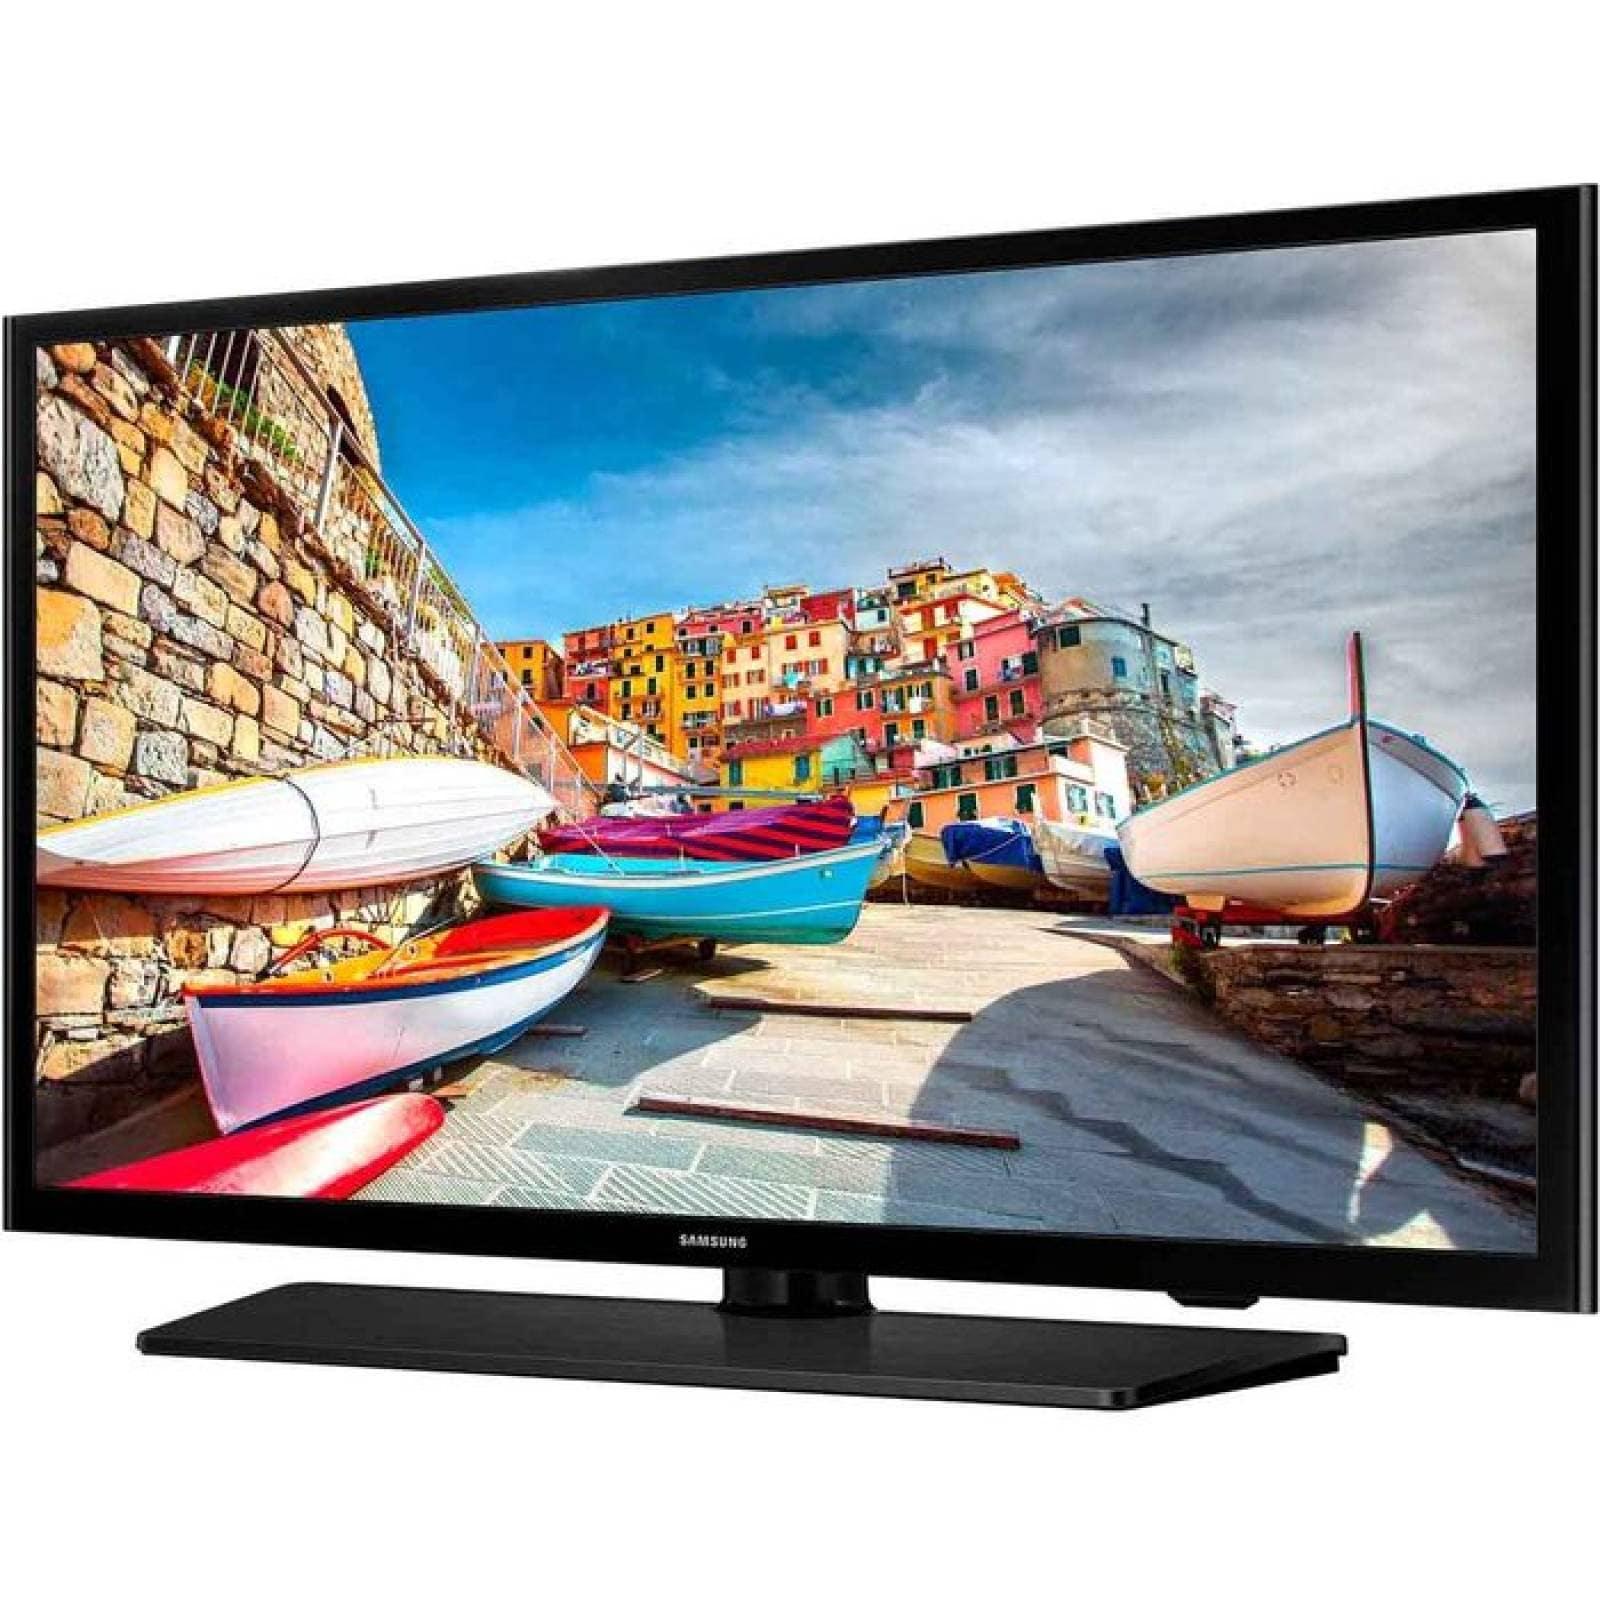 Samsung 477 HG40NE477SF TV LCD con pantalla LED de 40 quoty 1080p  16 9